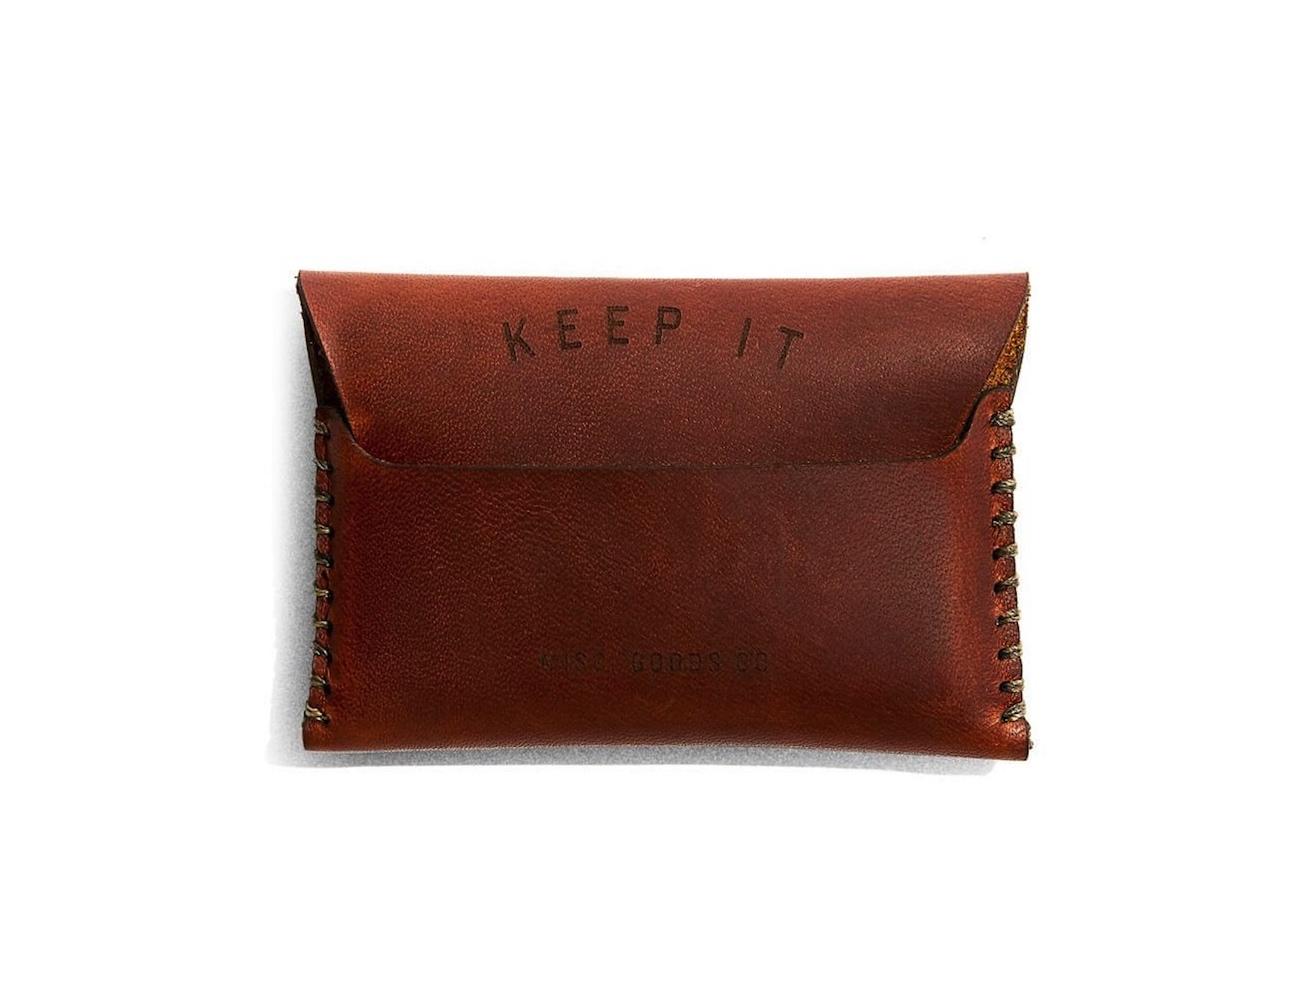 MGCO Minimalist Leather Wallet V3